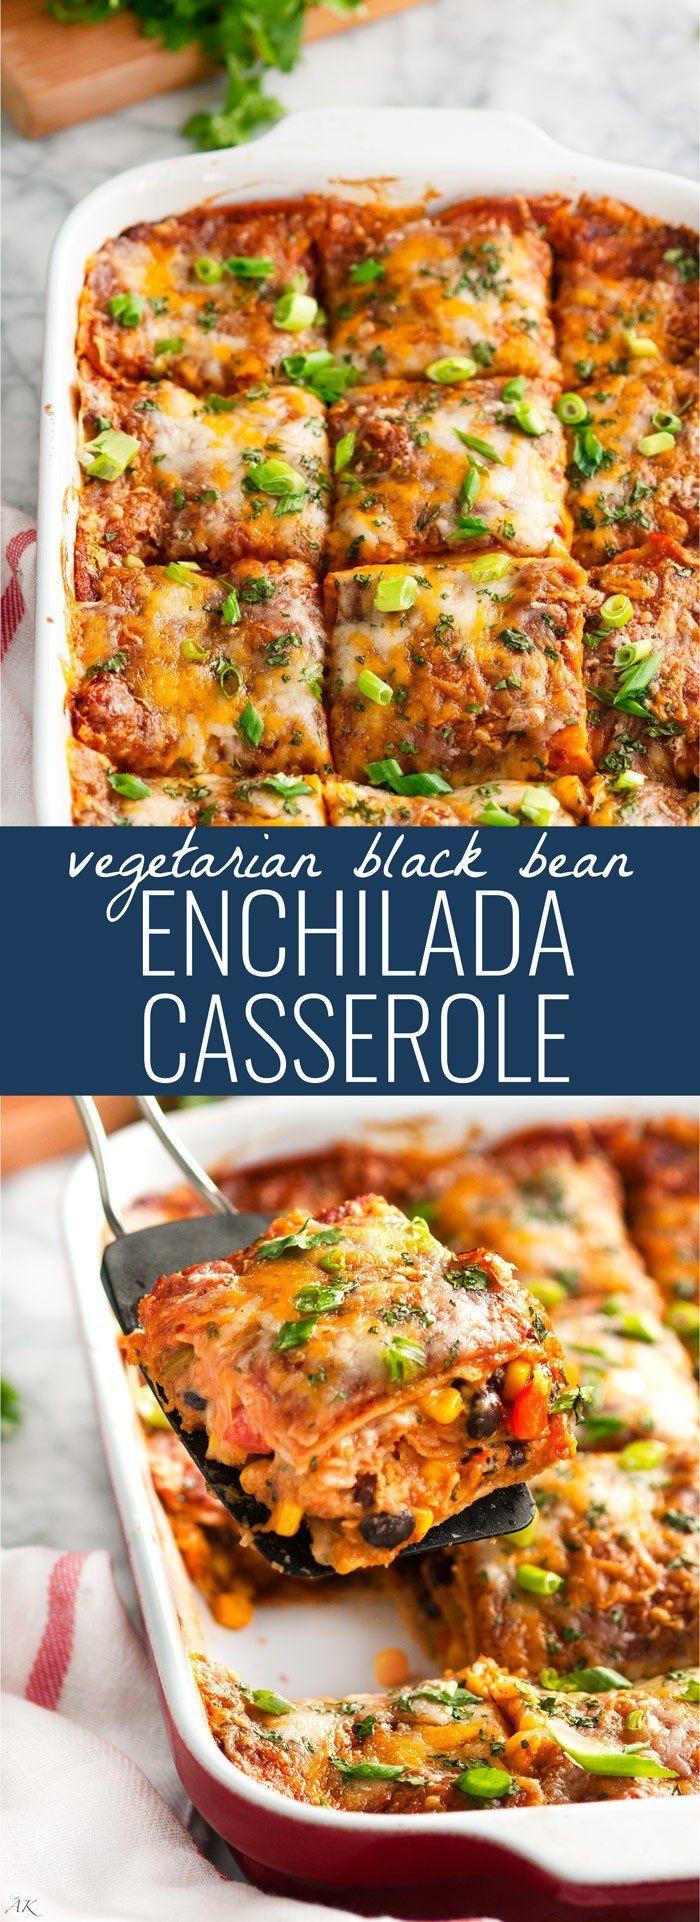 Vegetarian Black Bean Enchilada Casserole   http://aberdeenskitchen.com